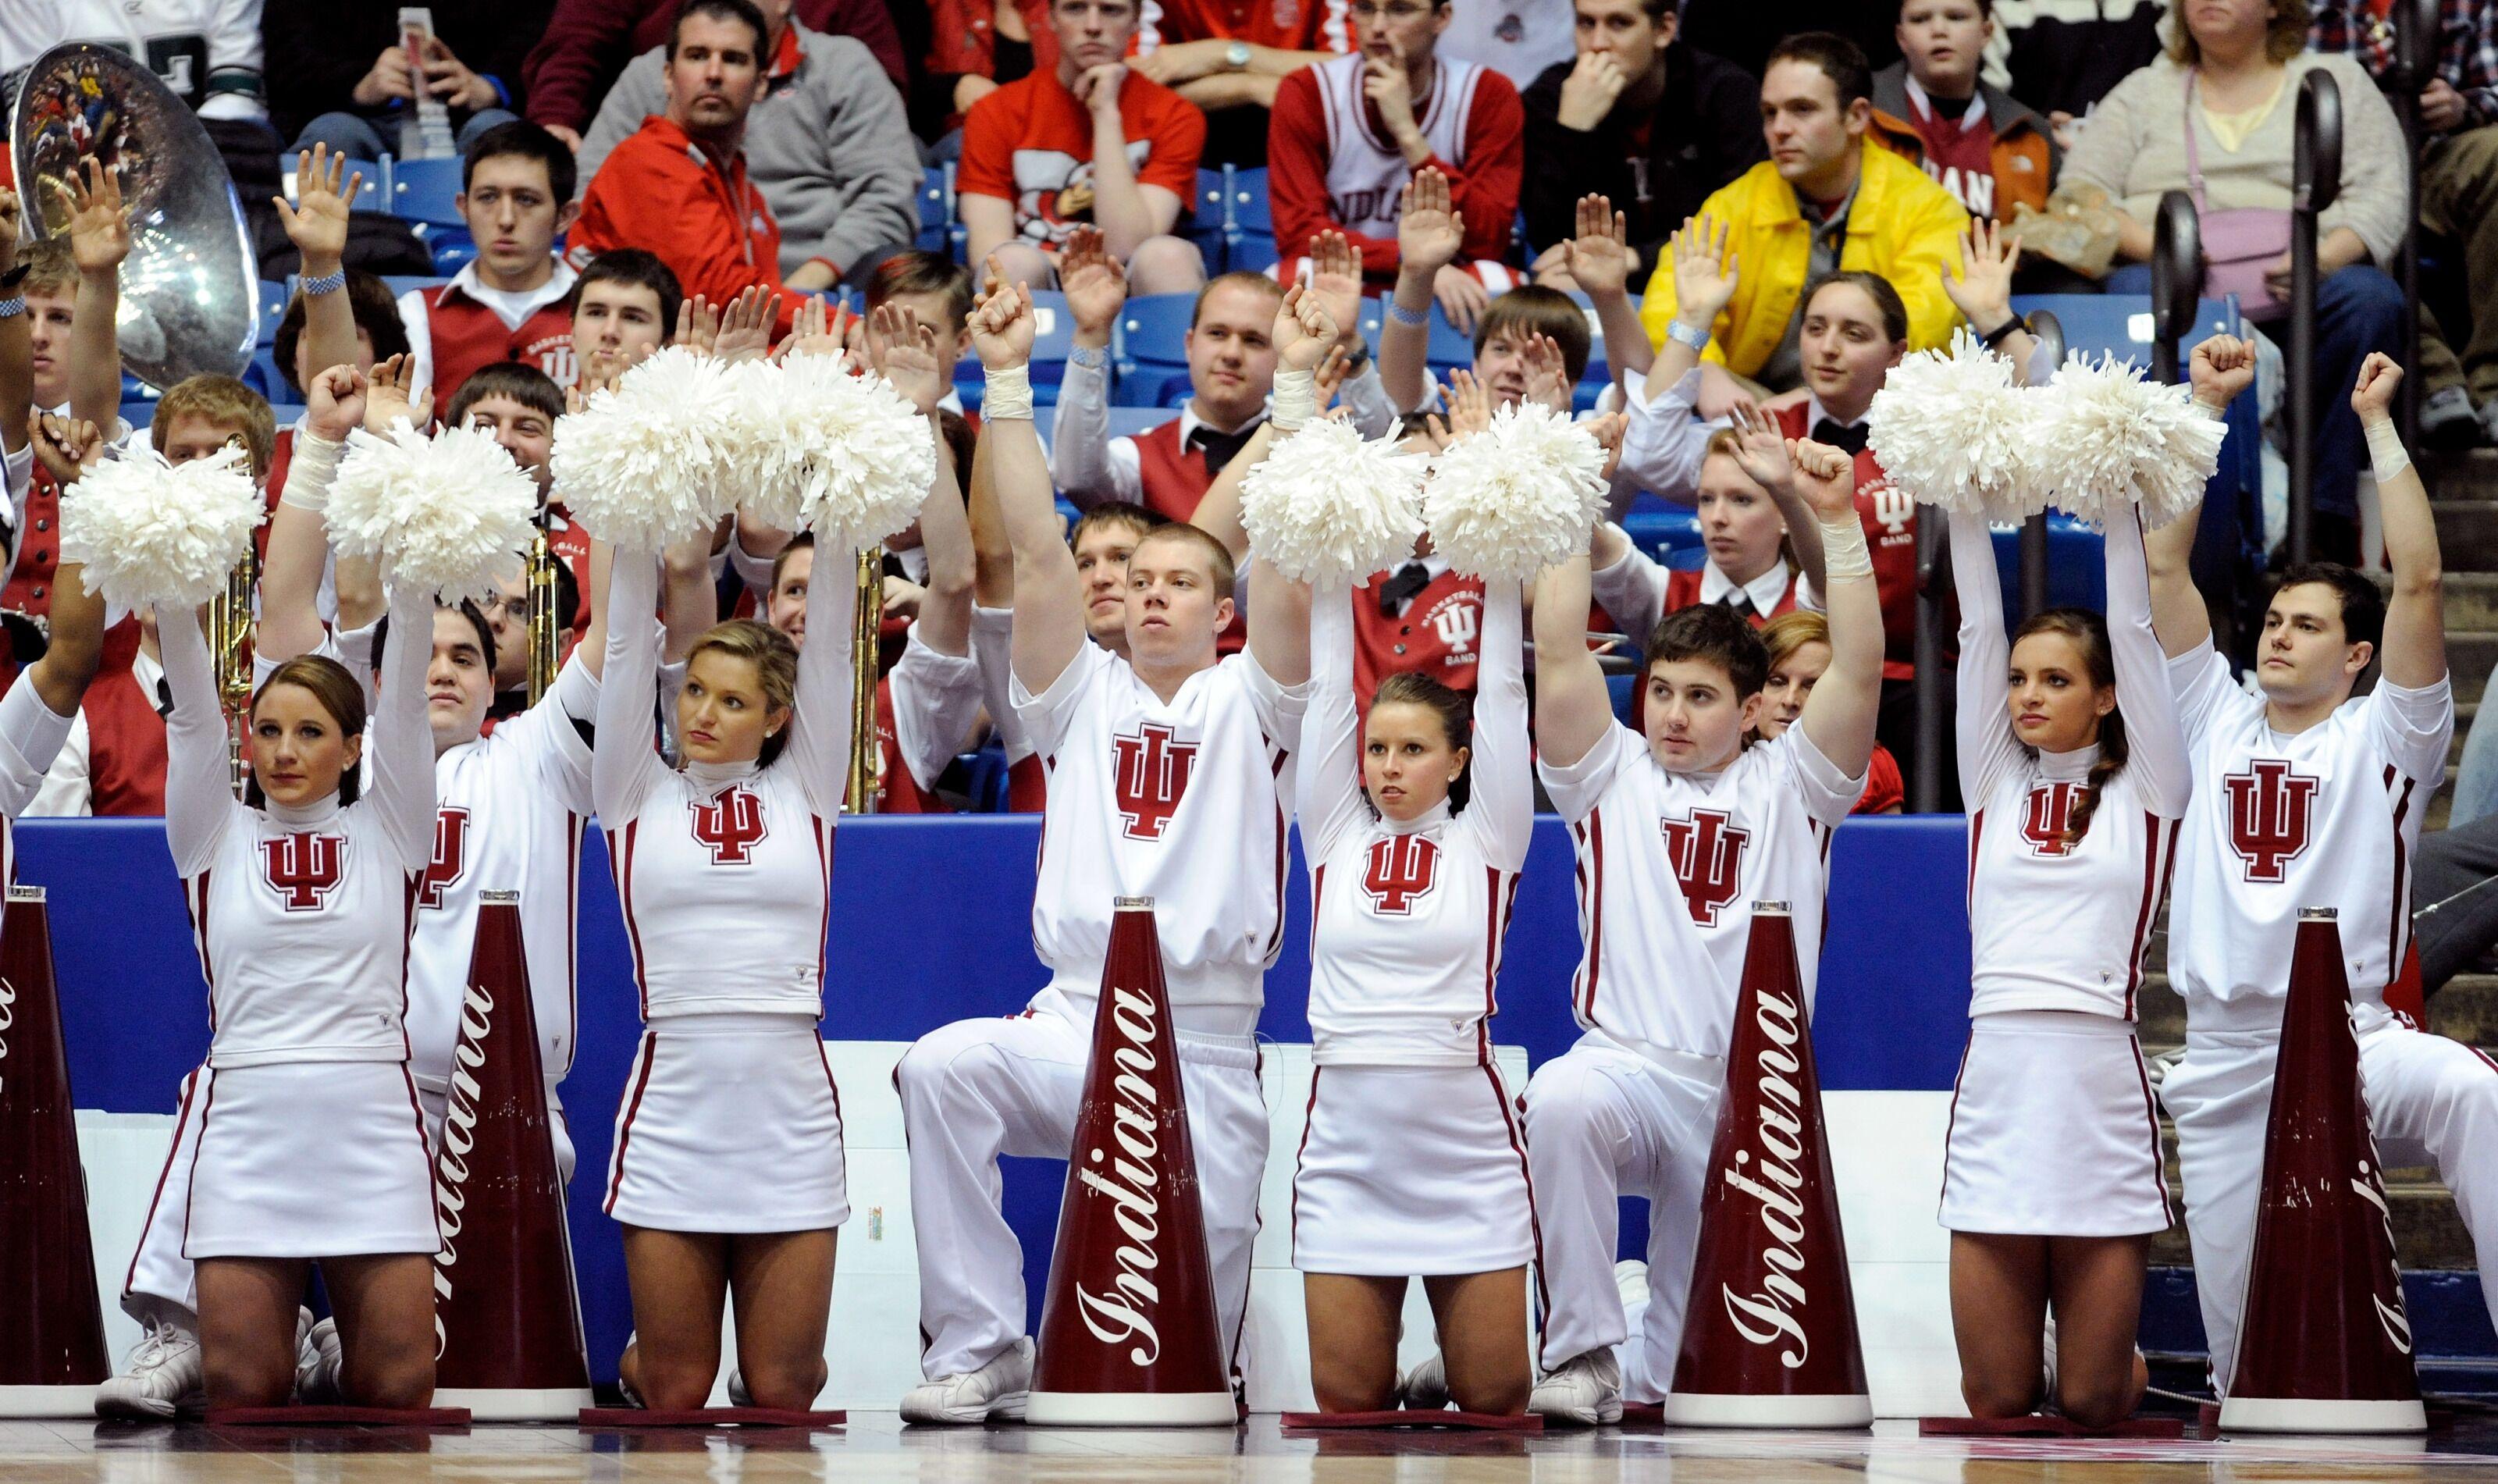 Indiana Basketball vs Nebraska: How to watch, injuries, odds